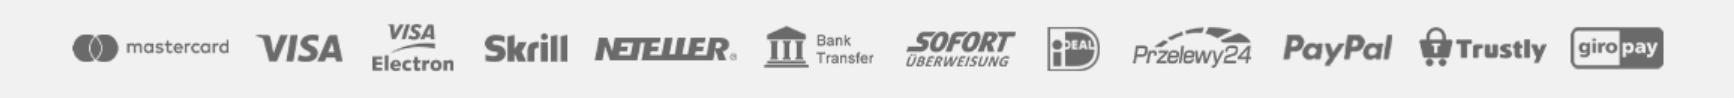 <em>Trade.com bietet unter anderem Skrill und Neteller als Zahlungsmethoden an</em>